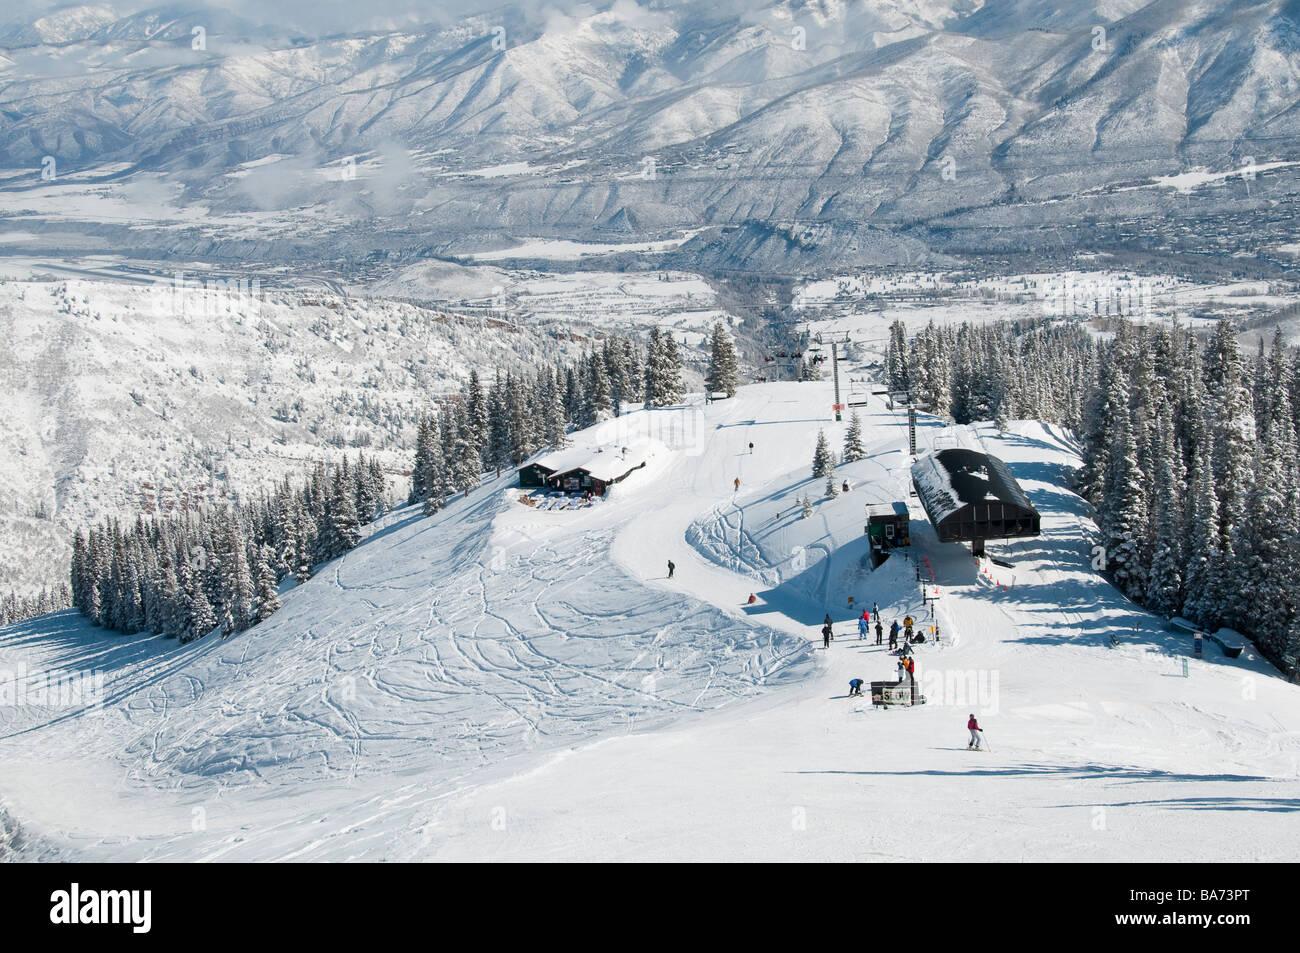 Cloud Nine Alpine Bistro and bottom of the Loge Peak Lift, Aspen Highlands Ski Area, Aspen, Colorado. - Stock Image